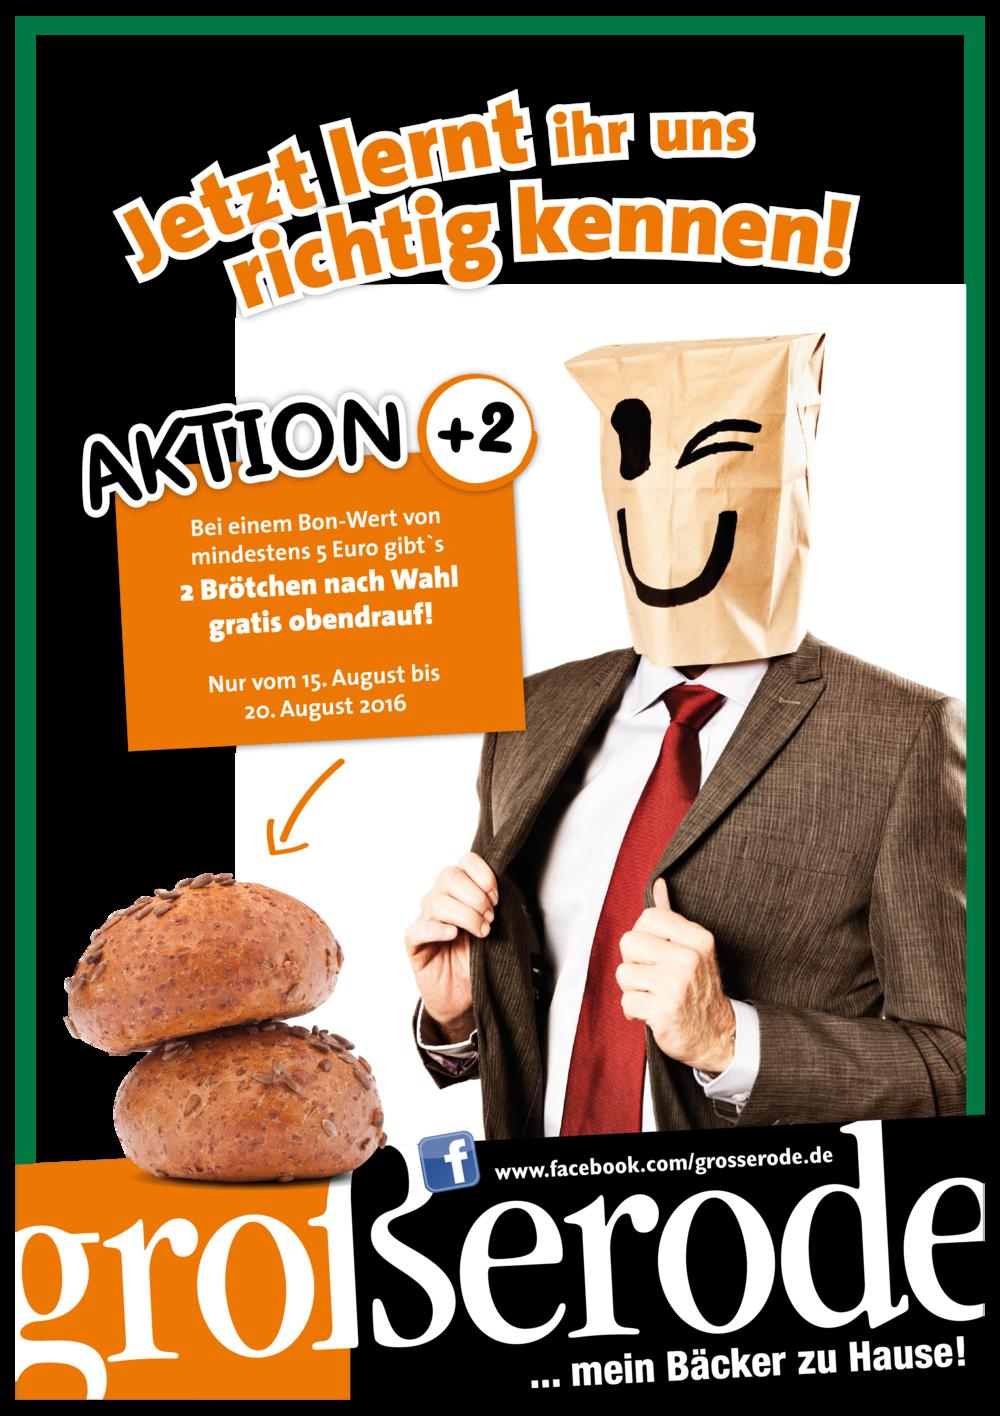 20160511_Grosserode_BroetchenAktion_PlakatA1_Druckdaten.png